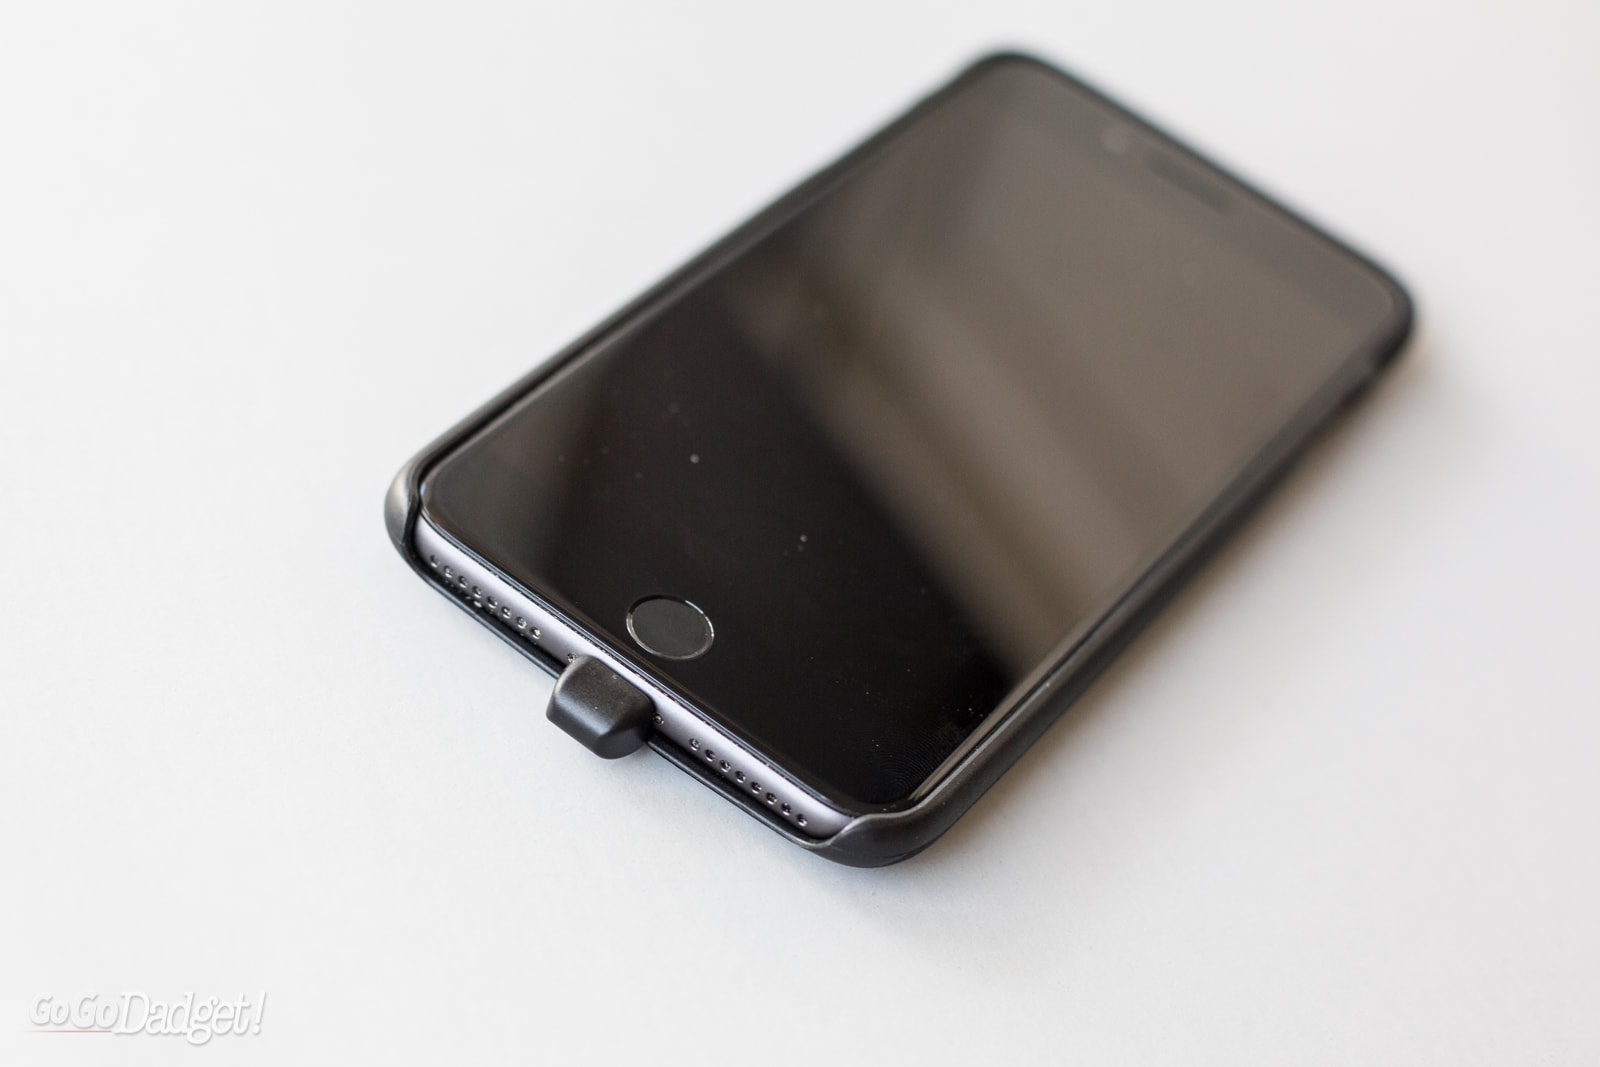 buy popular 3b931 c6490 Bezalel iPhone 7 Plus Latitude Wireless Charging Case Review